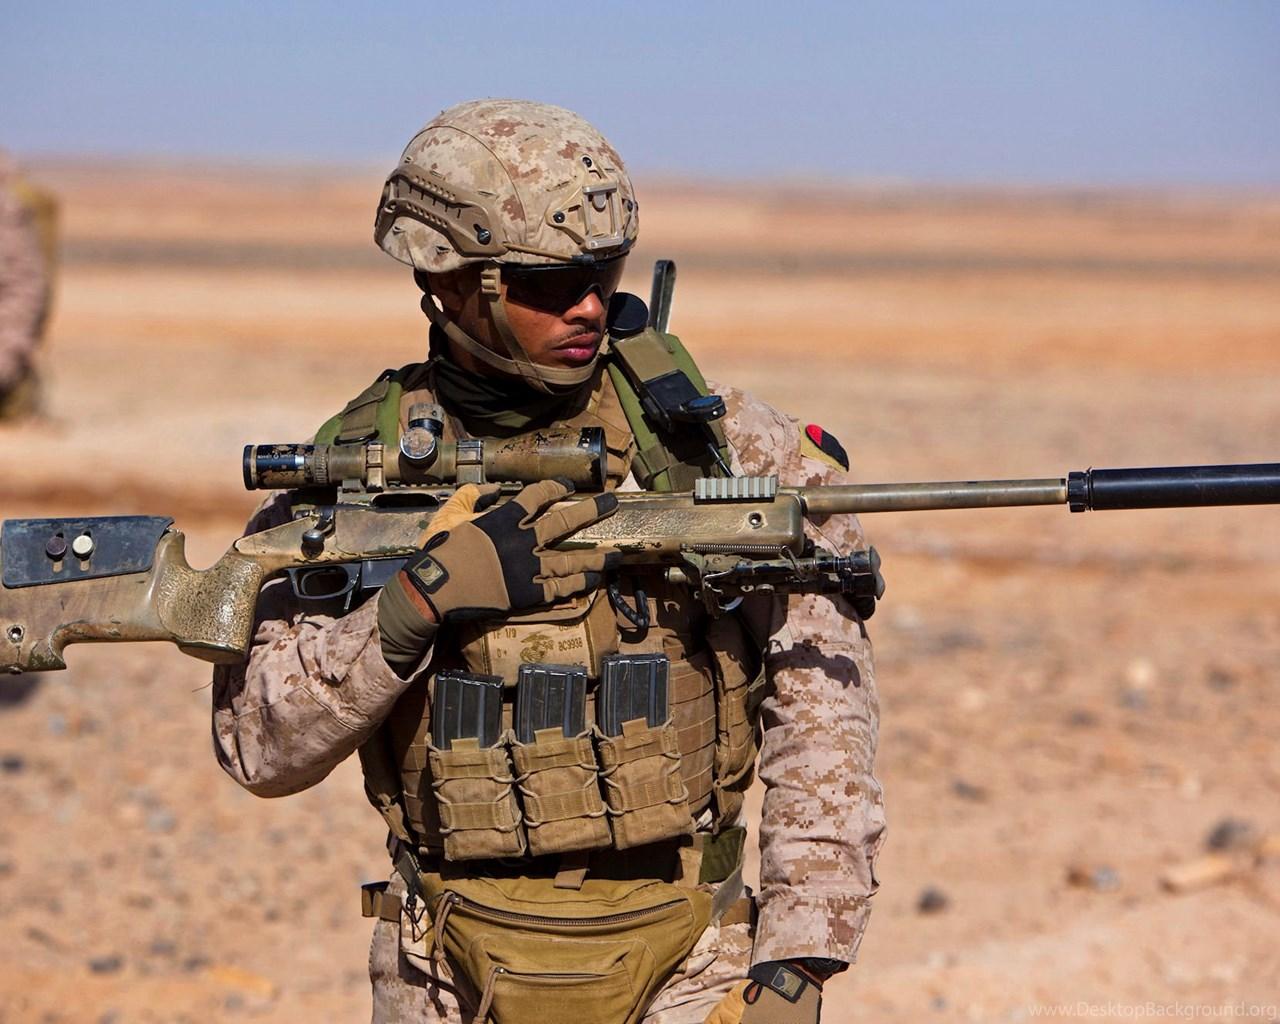 Usmc Sniper Manual download